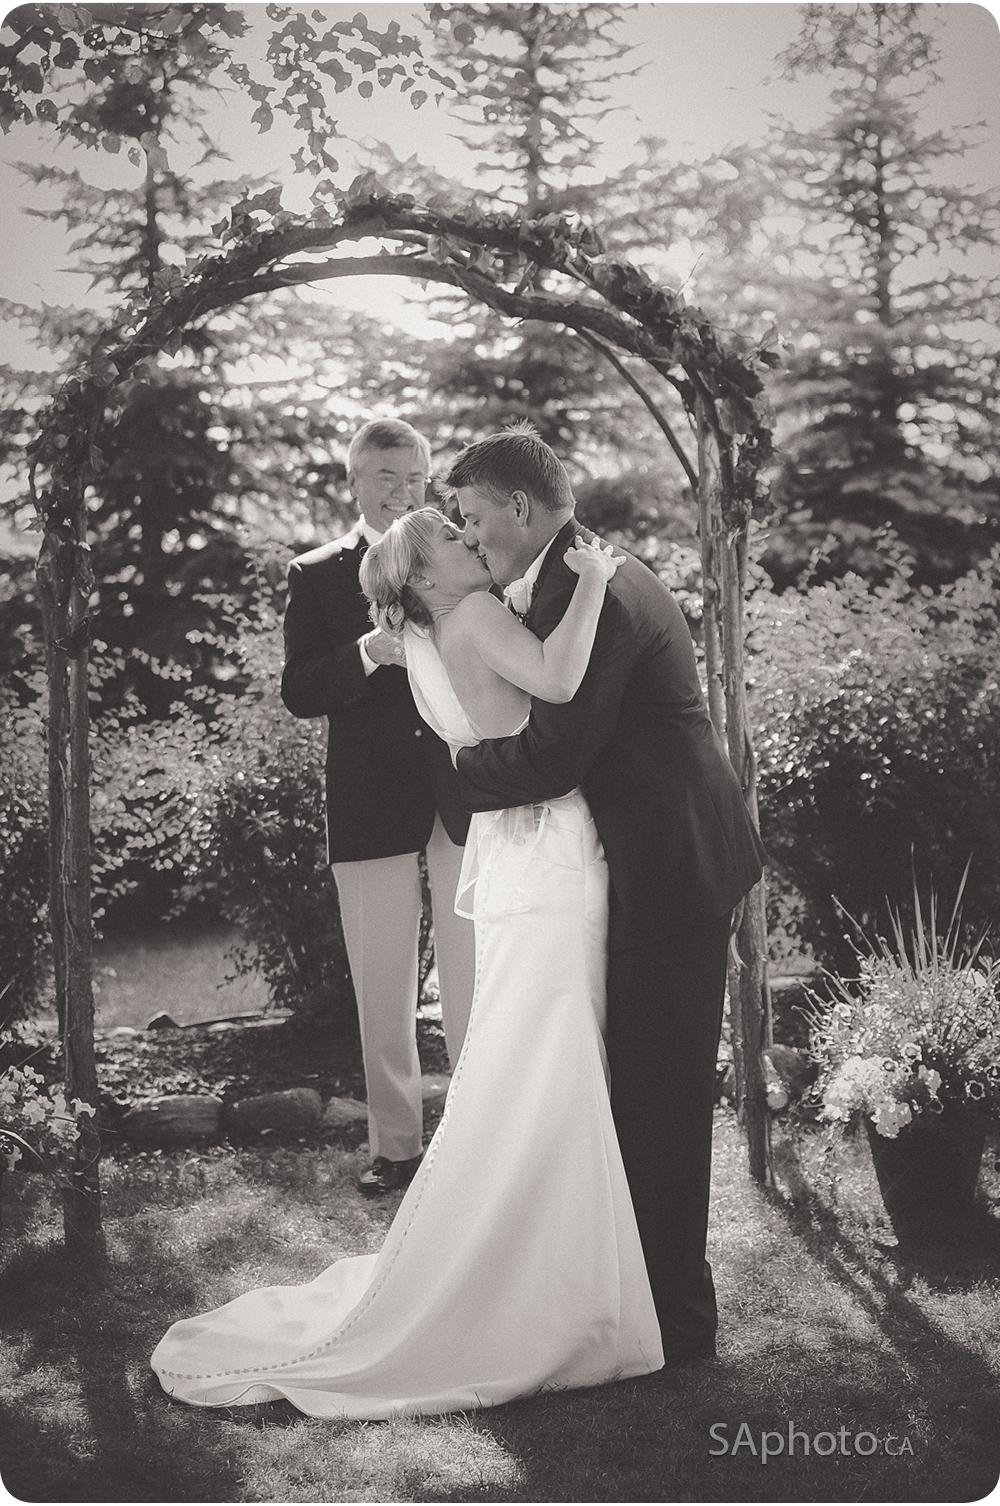 34-kissin-couple-wedding-outside-ceremony